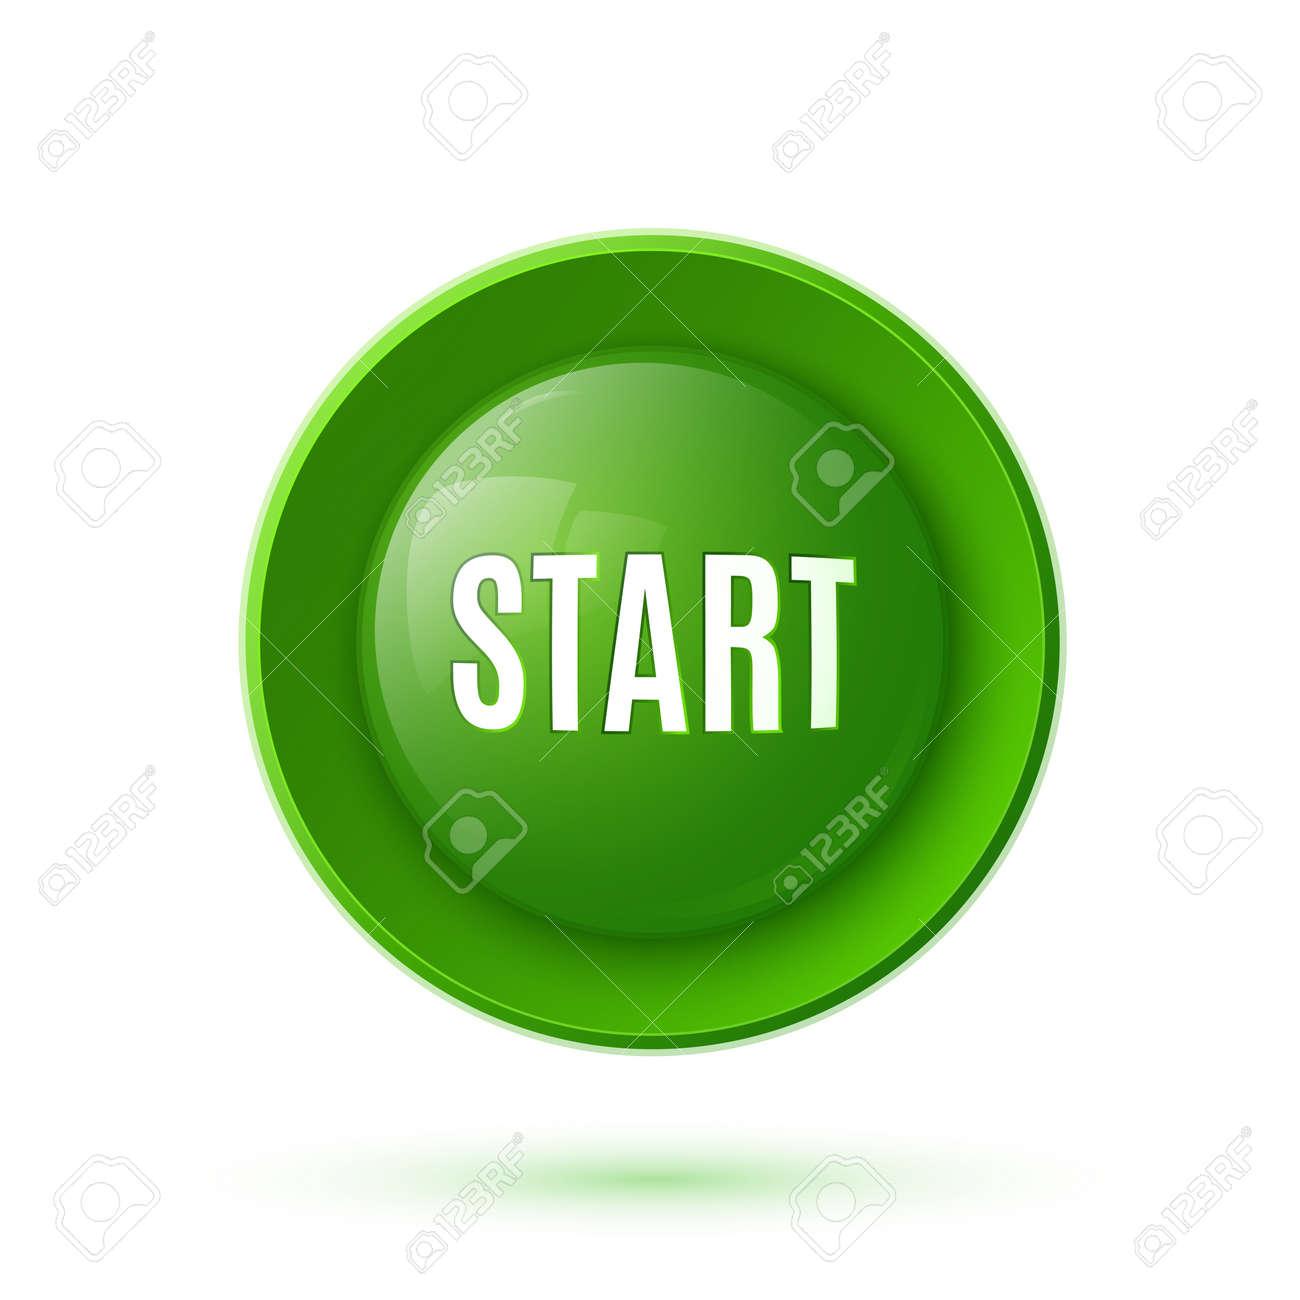 Green glossy start button icon Vector illustration